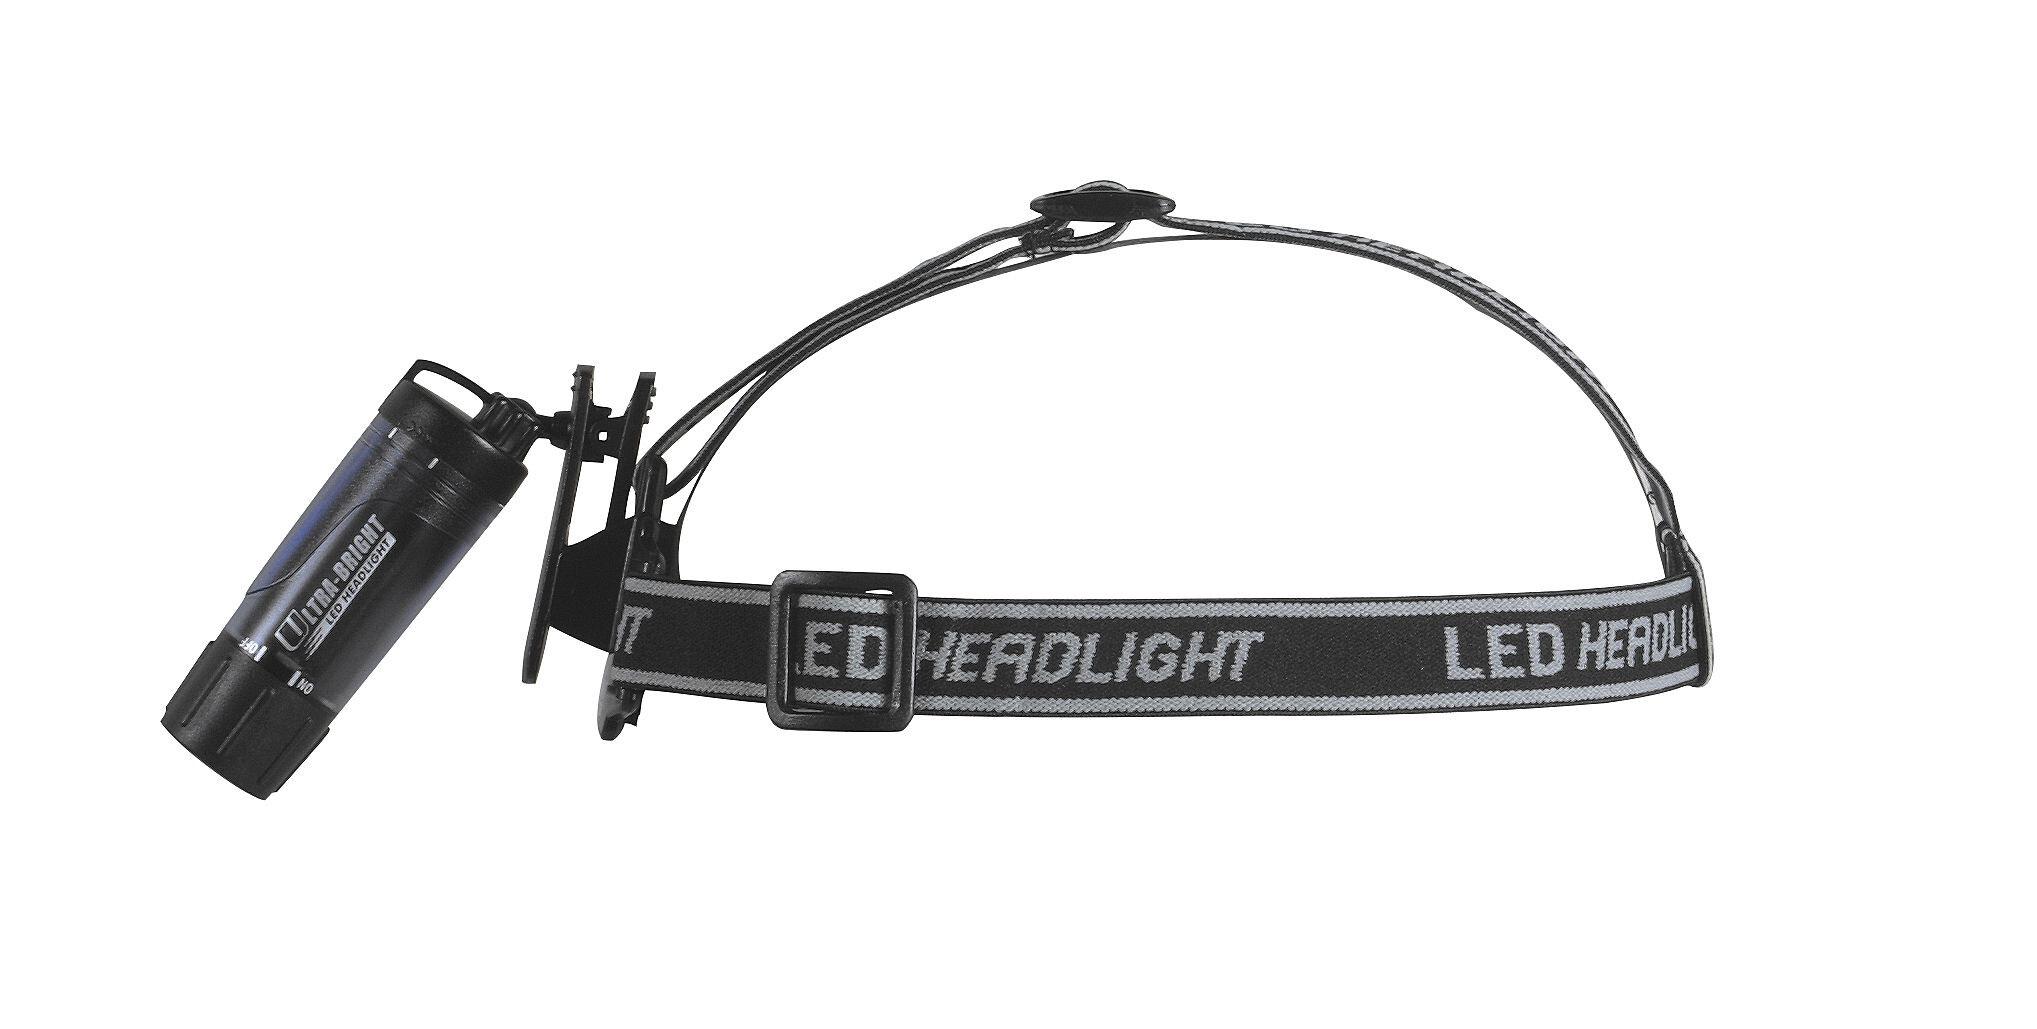 Relags LED Clip Lampada frontale nero   Bikester it -> Lampada Clip Led